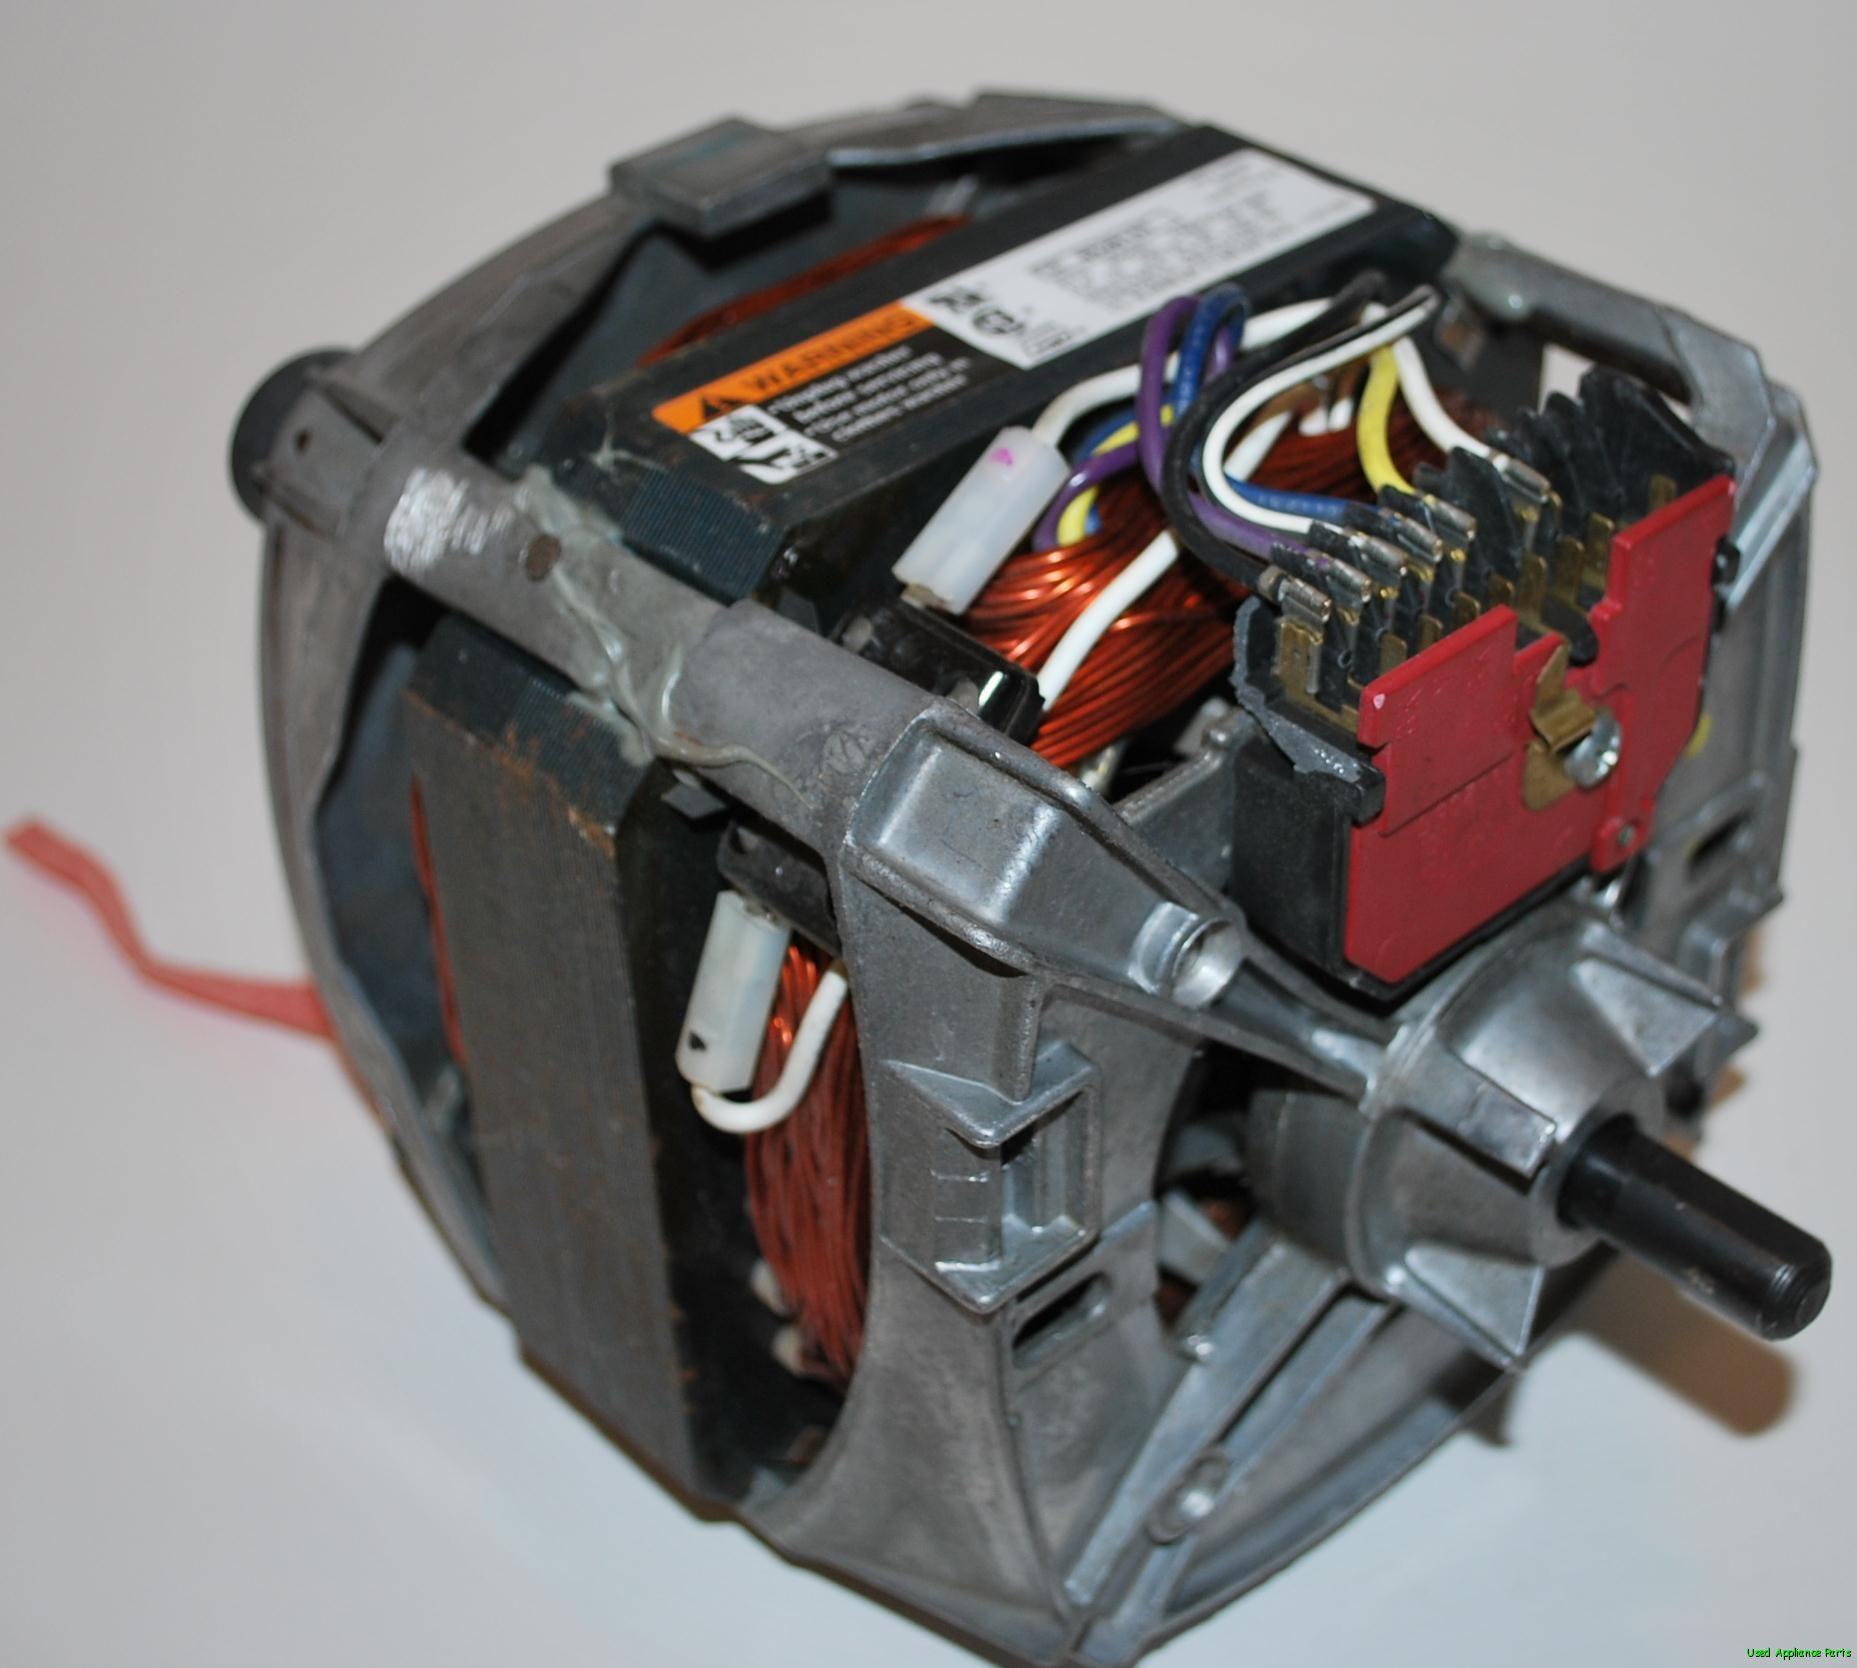 Motor de lavadora hace ruido pero no trabaja yoreparo for Whirlpool washer drive motor